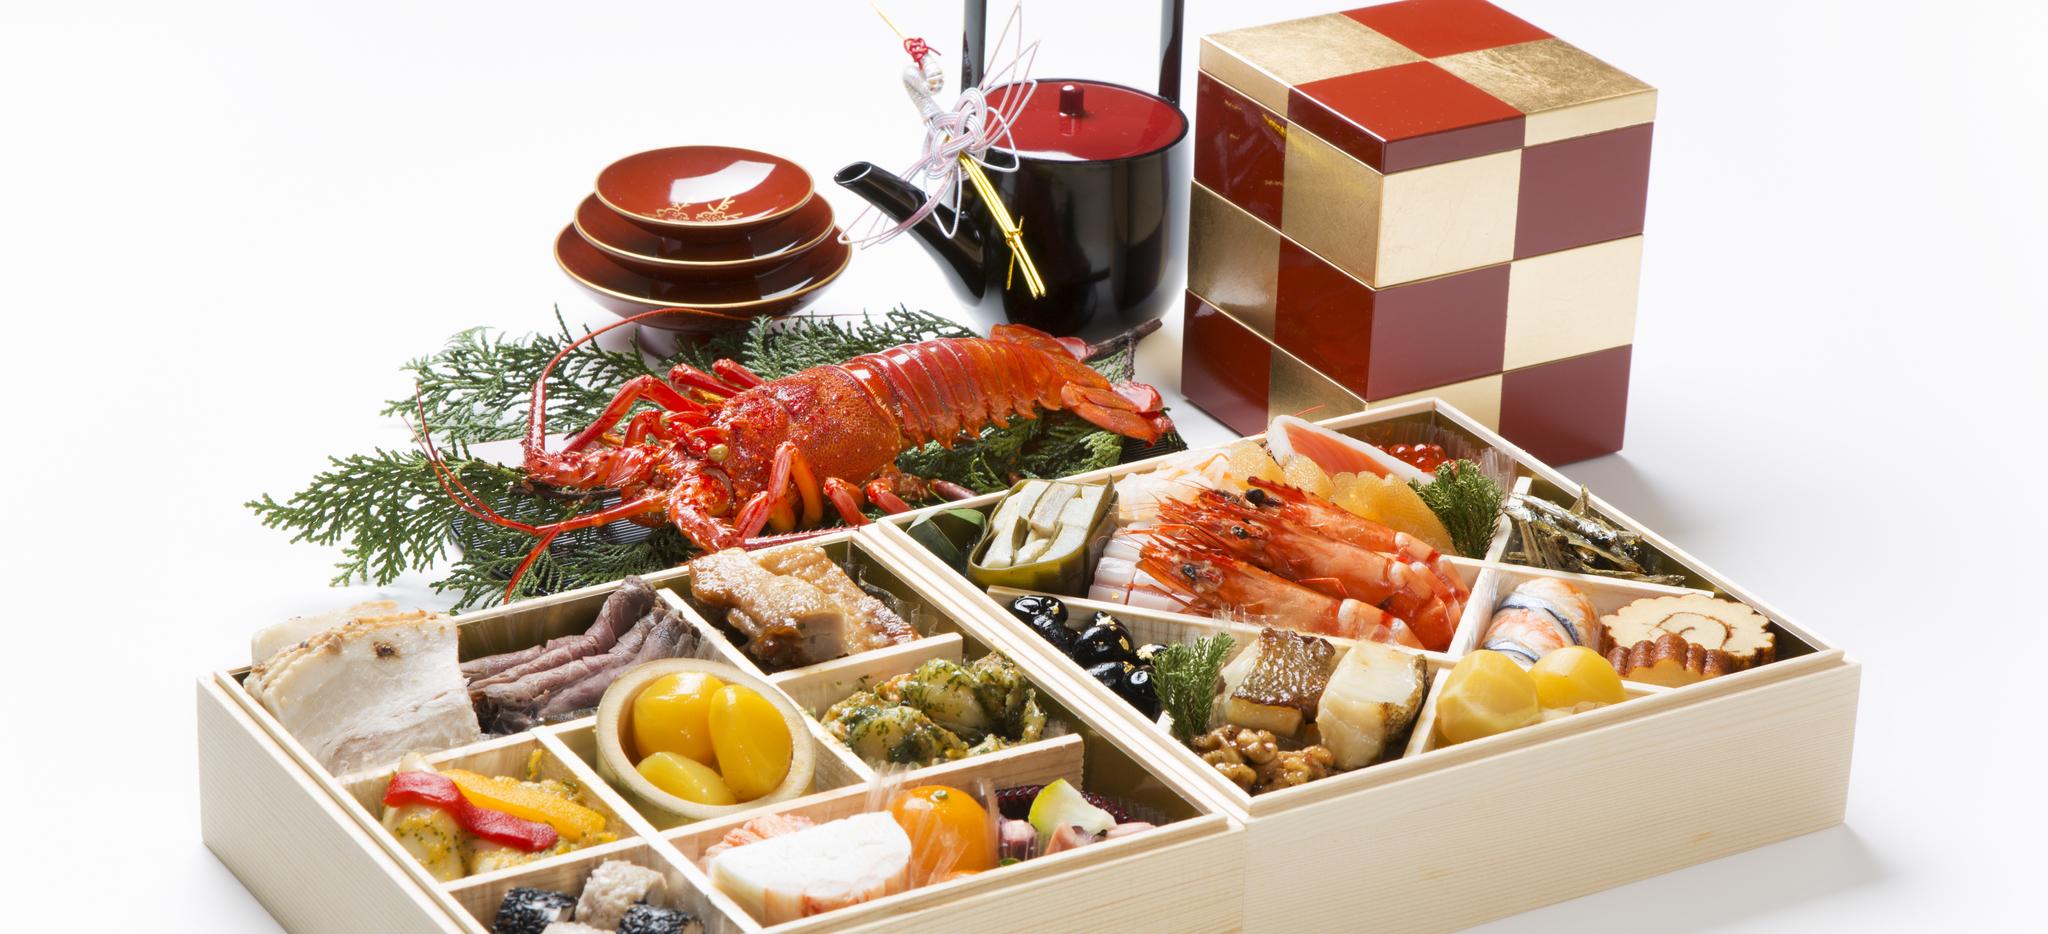 Osechi ryori Neujahrsessen in Japan